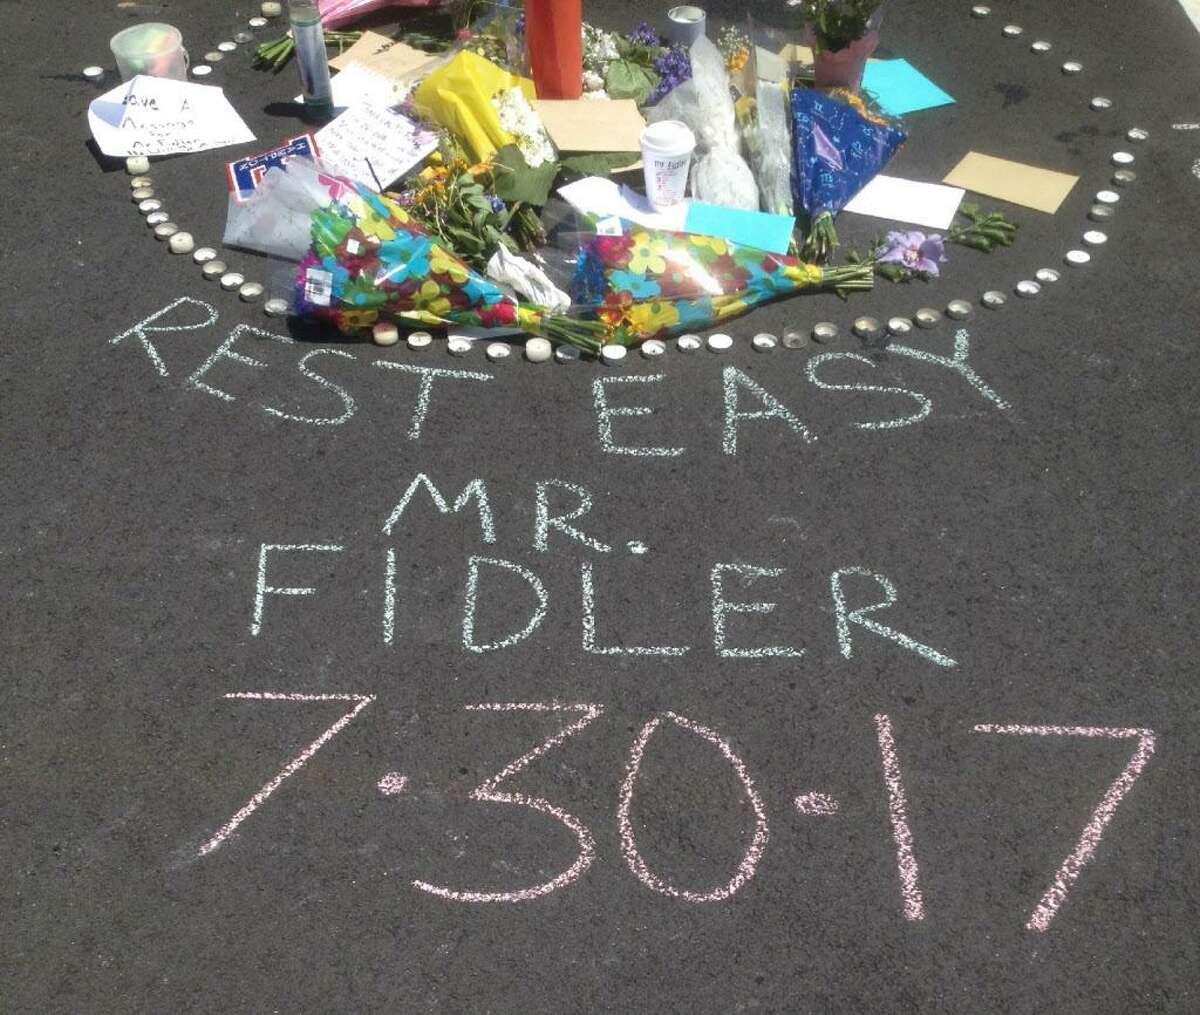 A chalked tribute to East Hampton High School Principal John Fidler marks his parking spot.